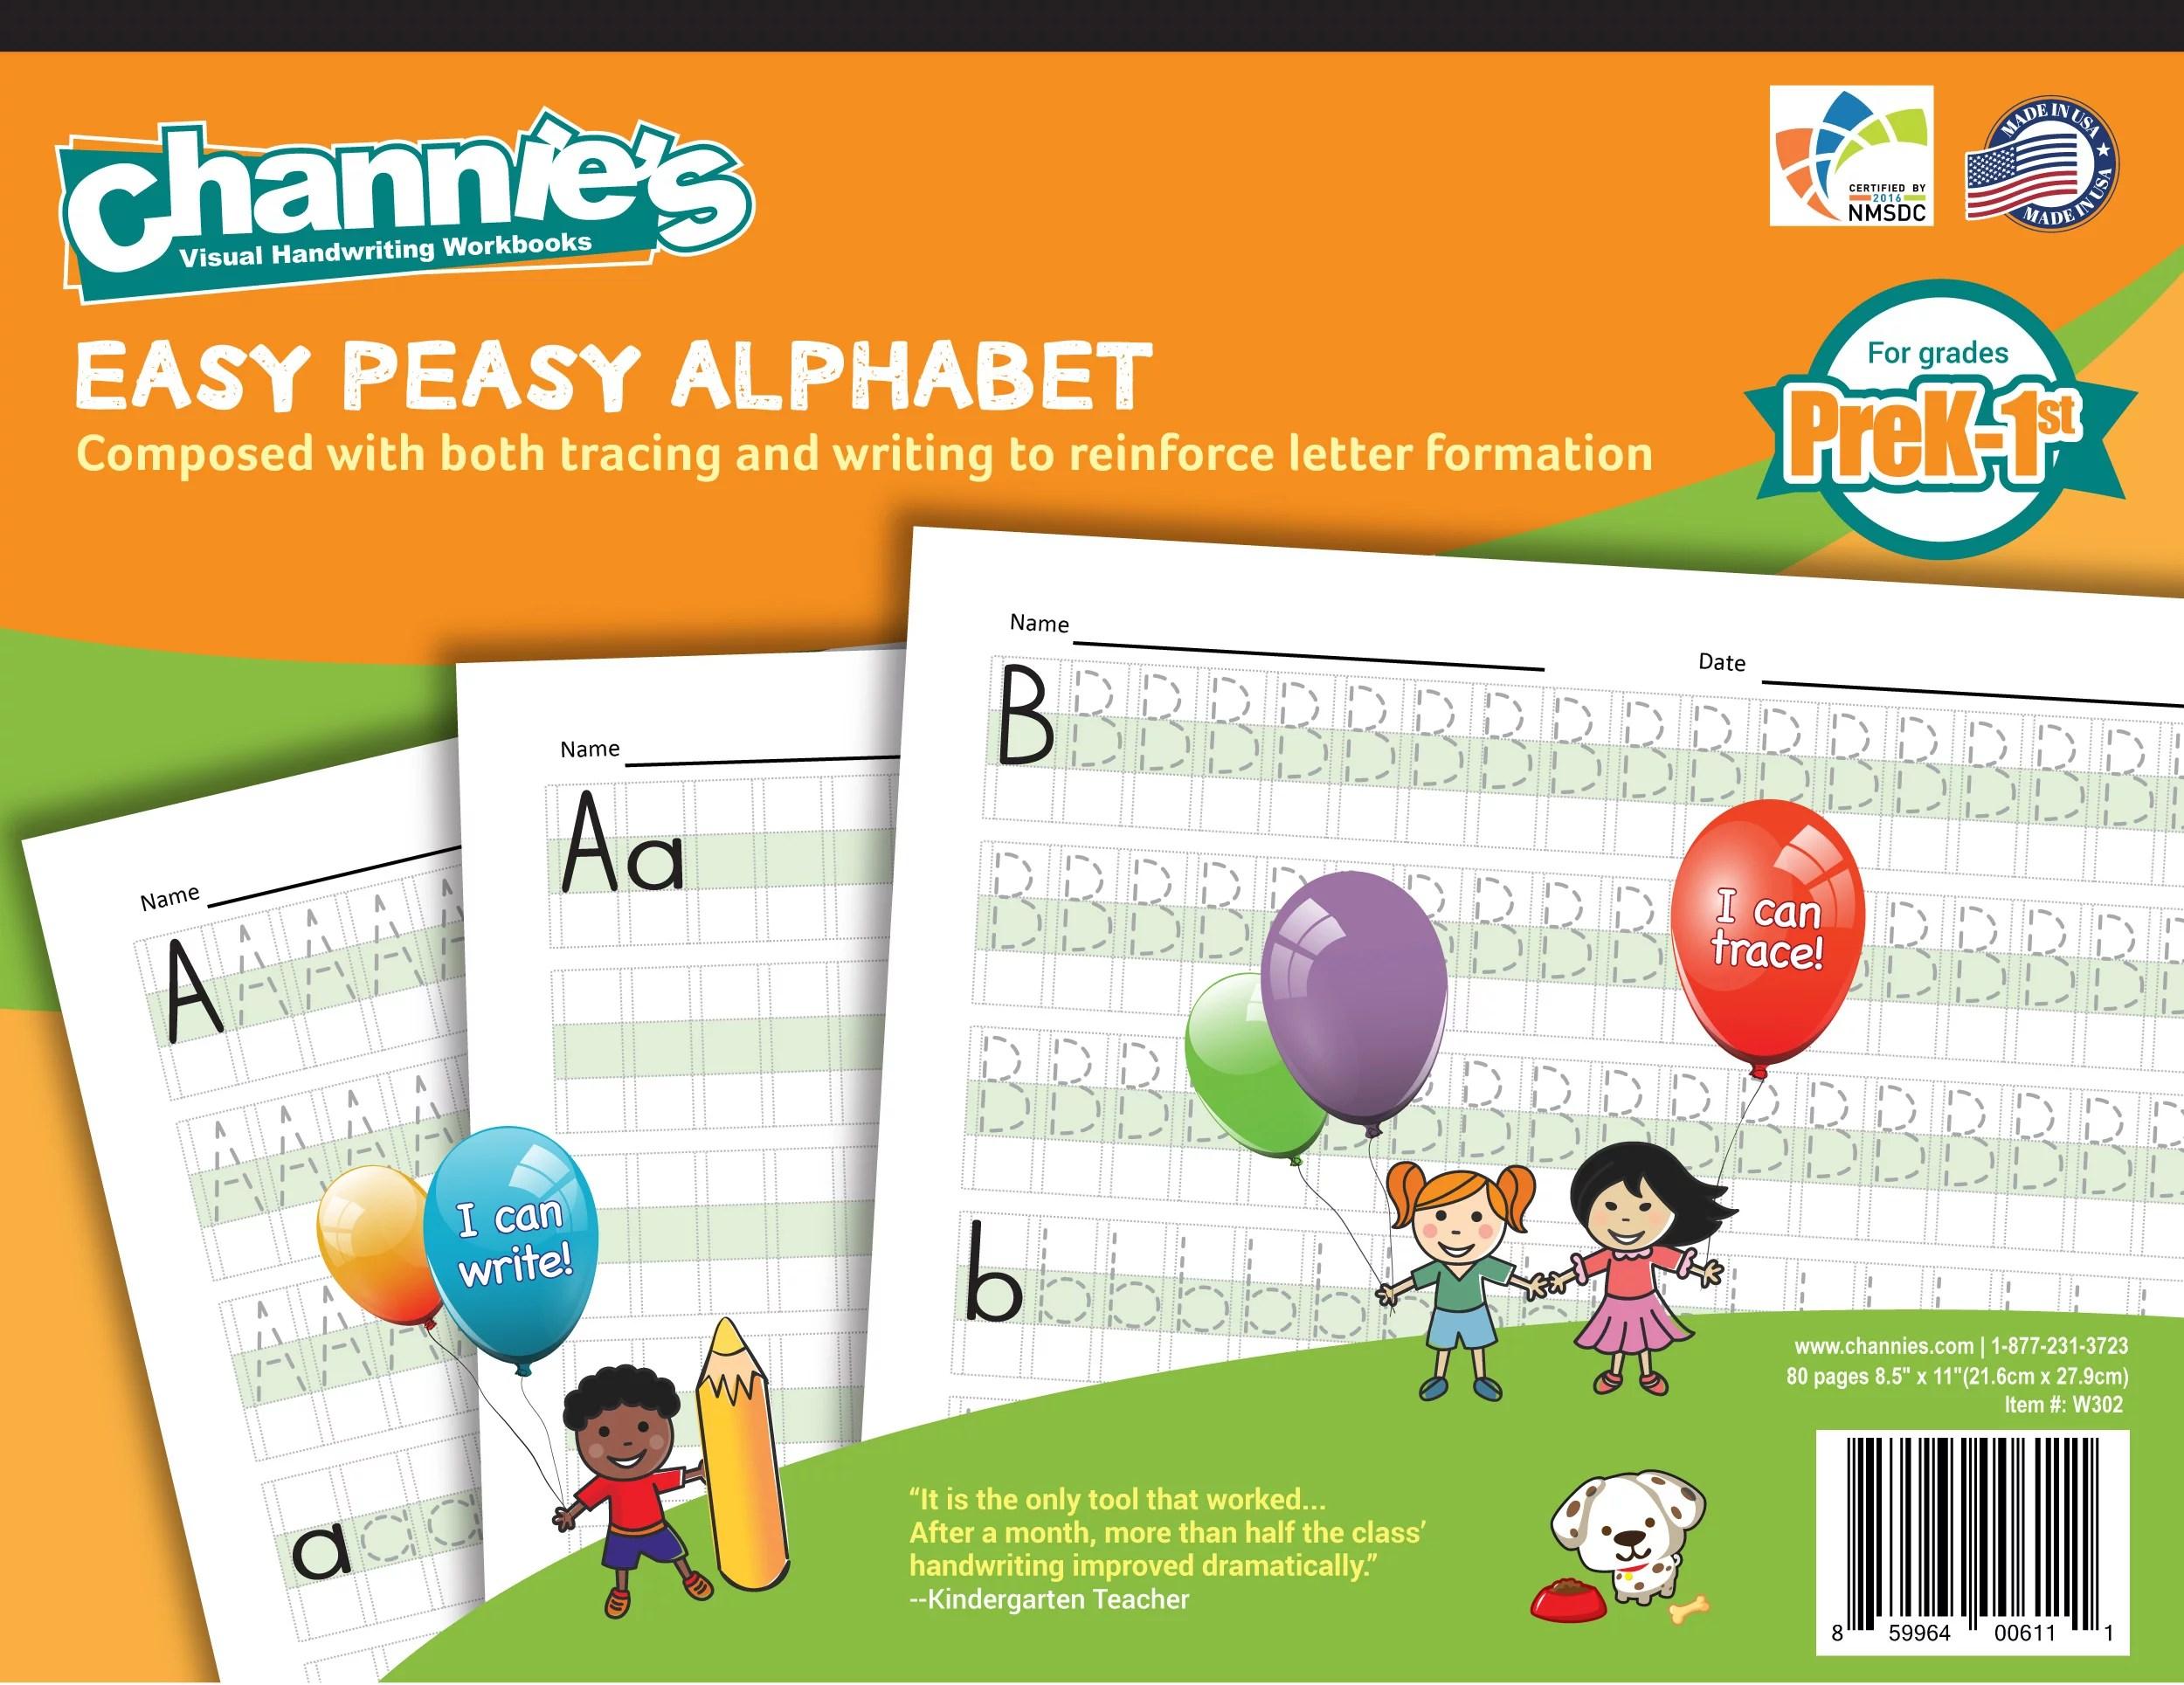 Channie S Easy Peasy Handwriting Alphabet Workbook For